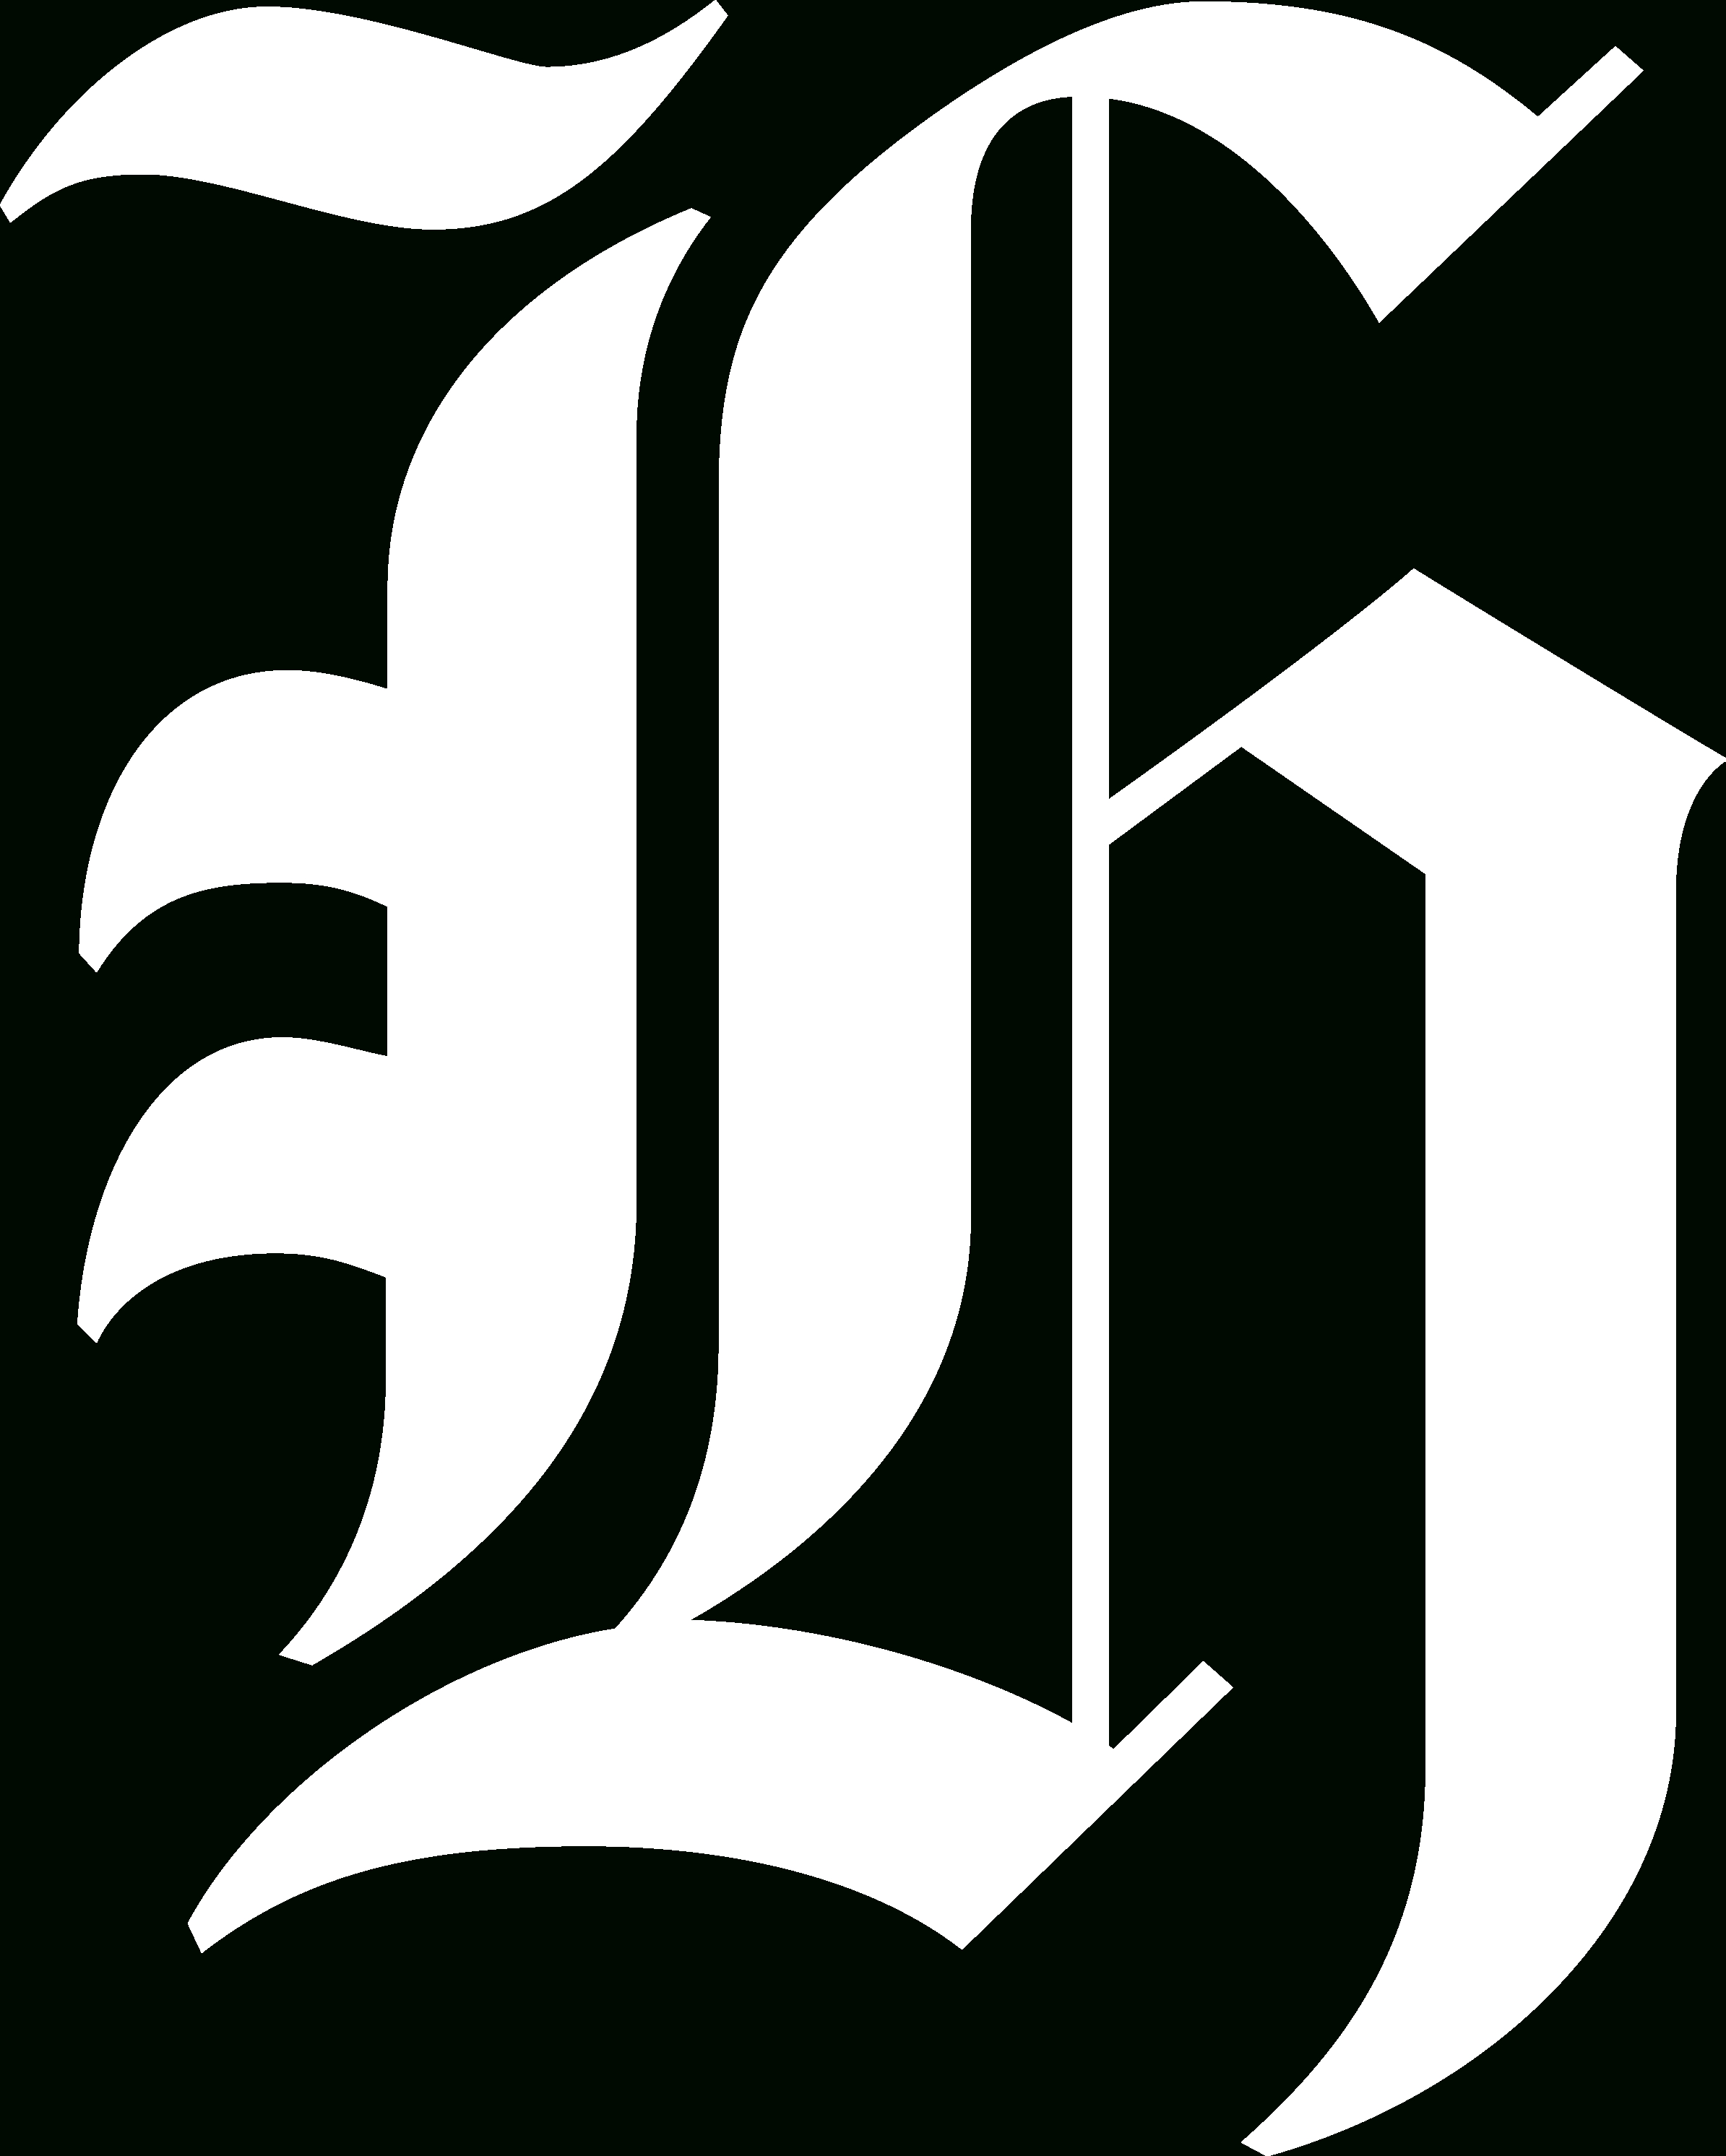 Crossword Puzzles - Nz Herald - Print Puzzle Nz